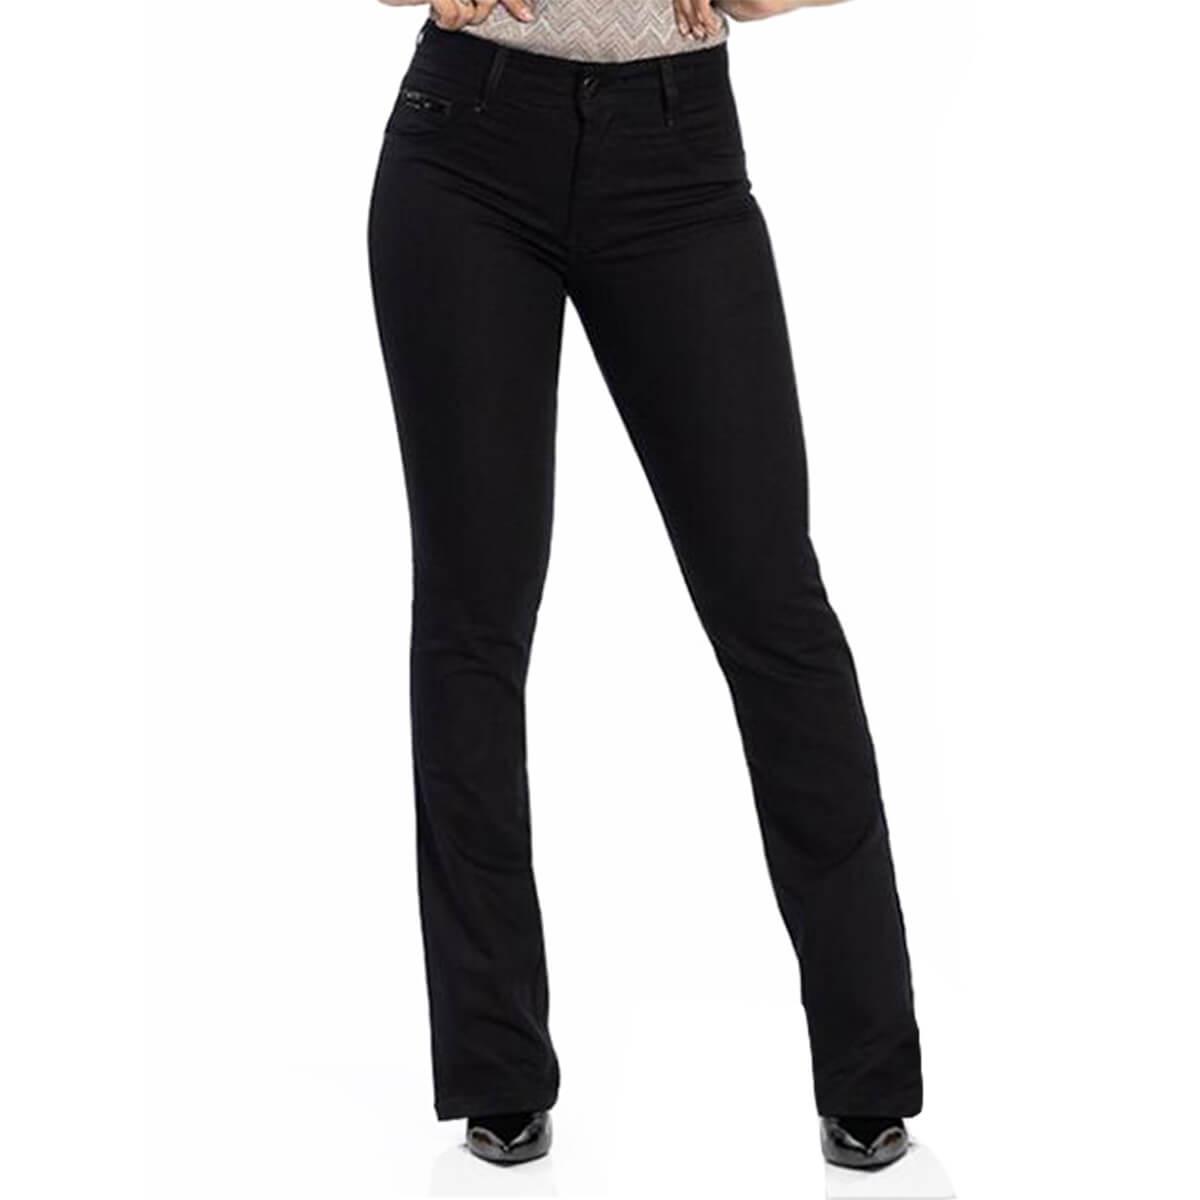 Calça Jeans Feminina Cal Fit Black